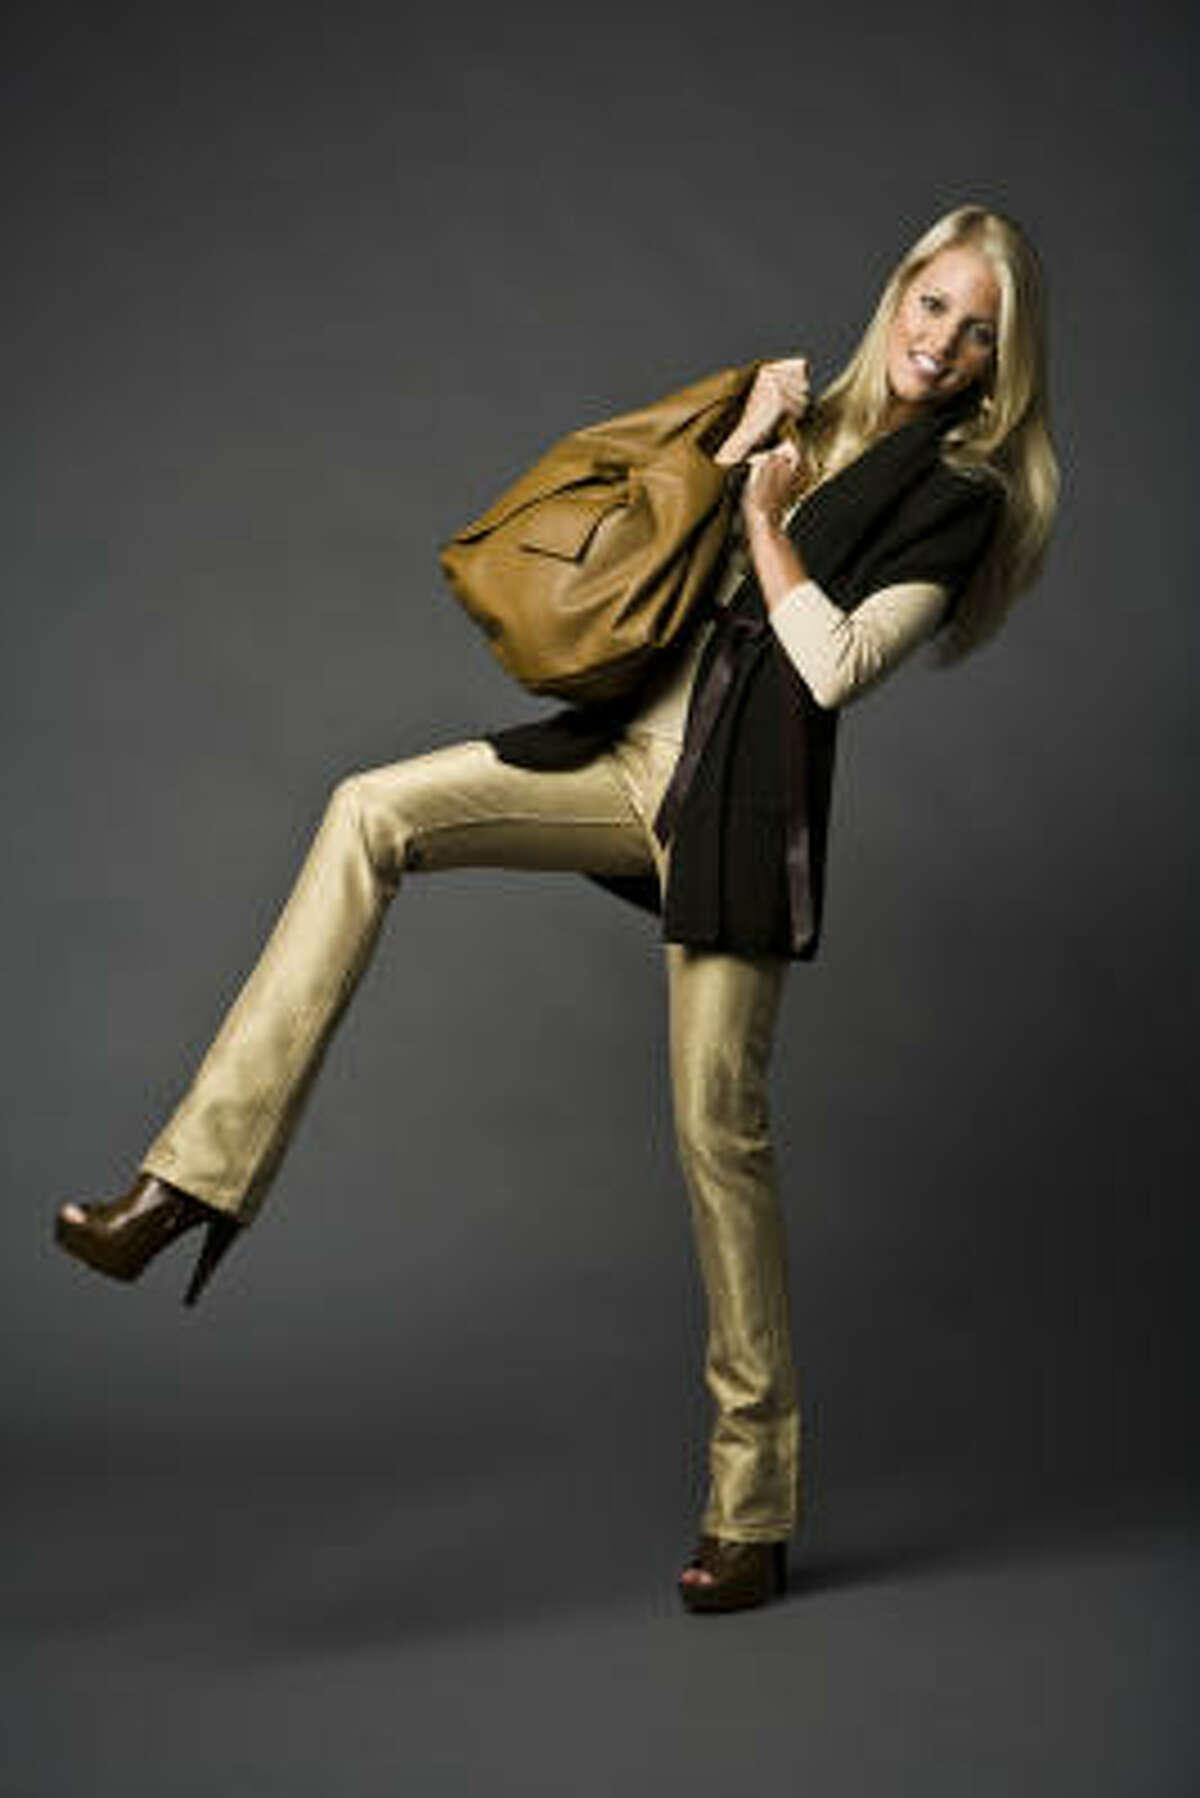 Valentino's new 360 large bag in brown. Sergio Rossi heels, $995, Ralph Lauren gold jeans, $555, tan top, $155, and Vince sweater vest in dark olive, $295, Neiman Marcus. Ralph Lauren necklace, $98, an earrings, $44, Nordstrom.